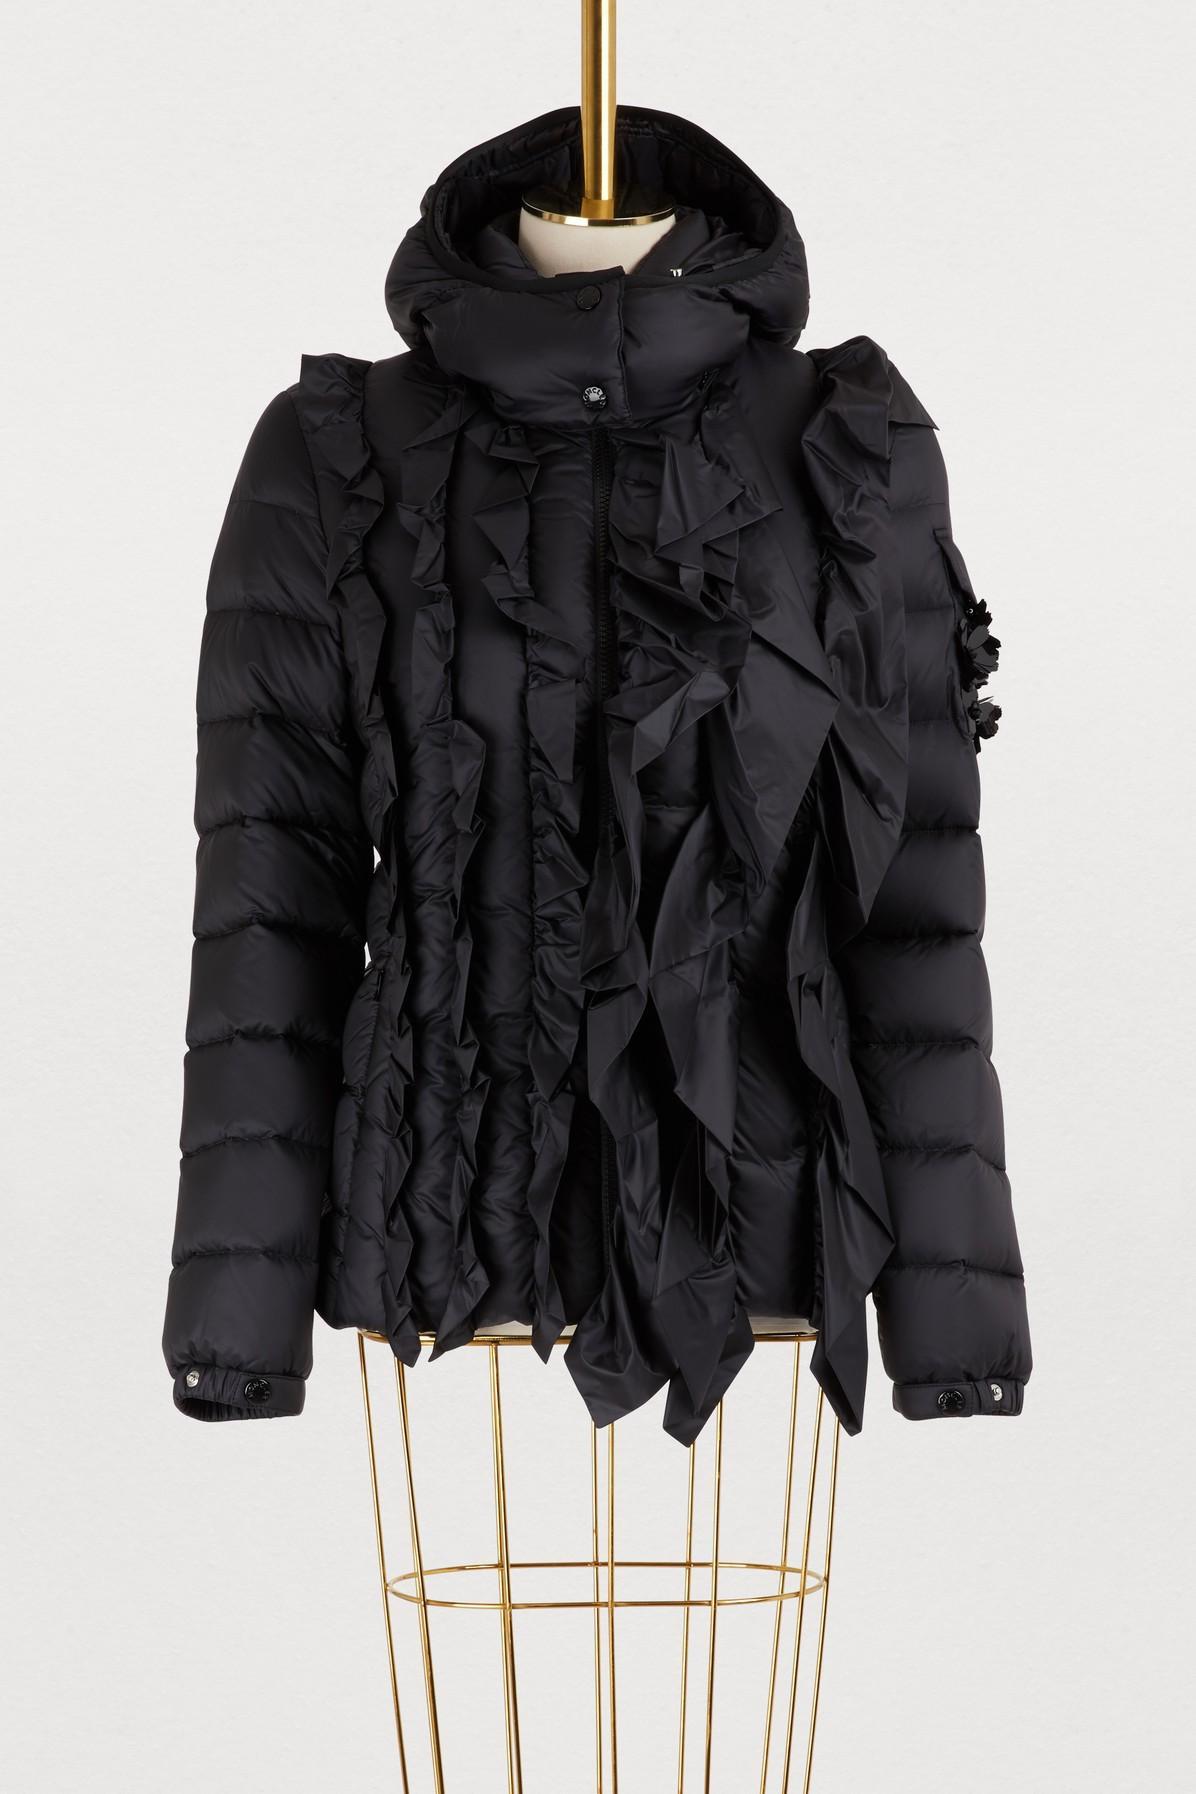 15d33b171 4 Moncler Simone Rocha Darcy Down Jacket in 999-Black